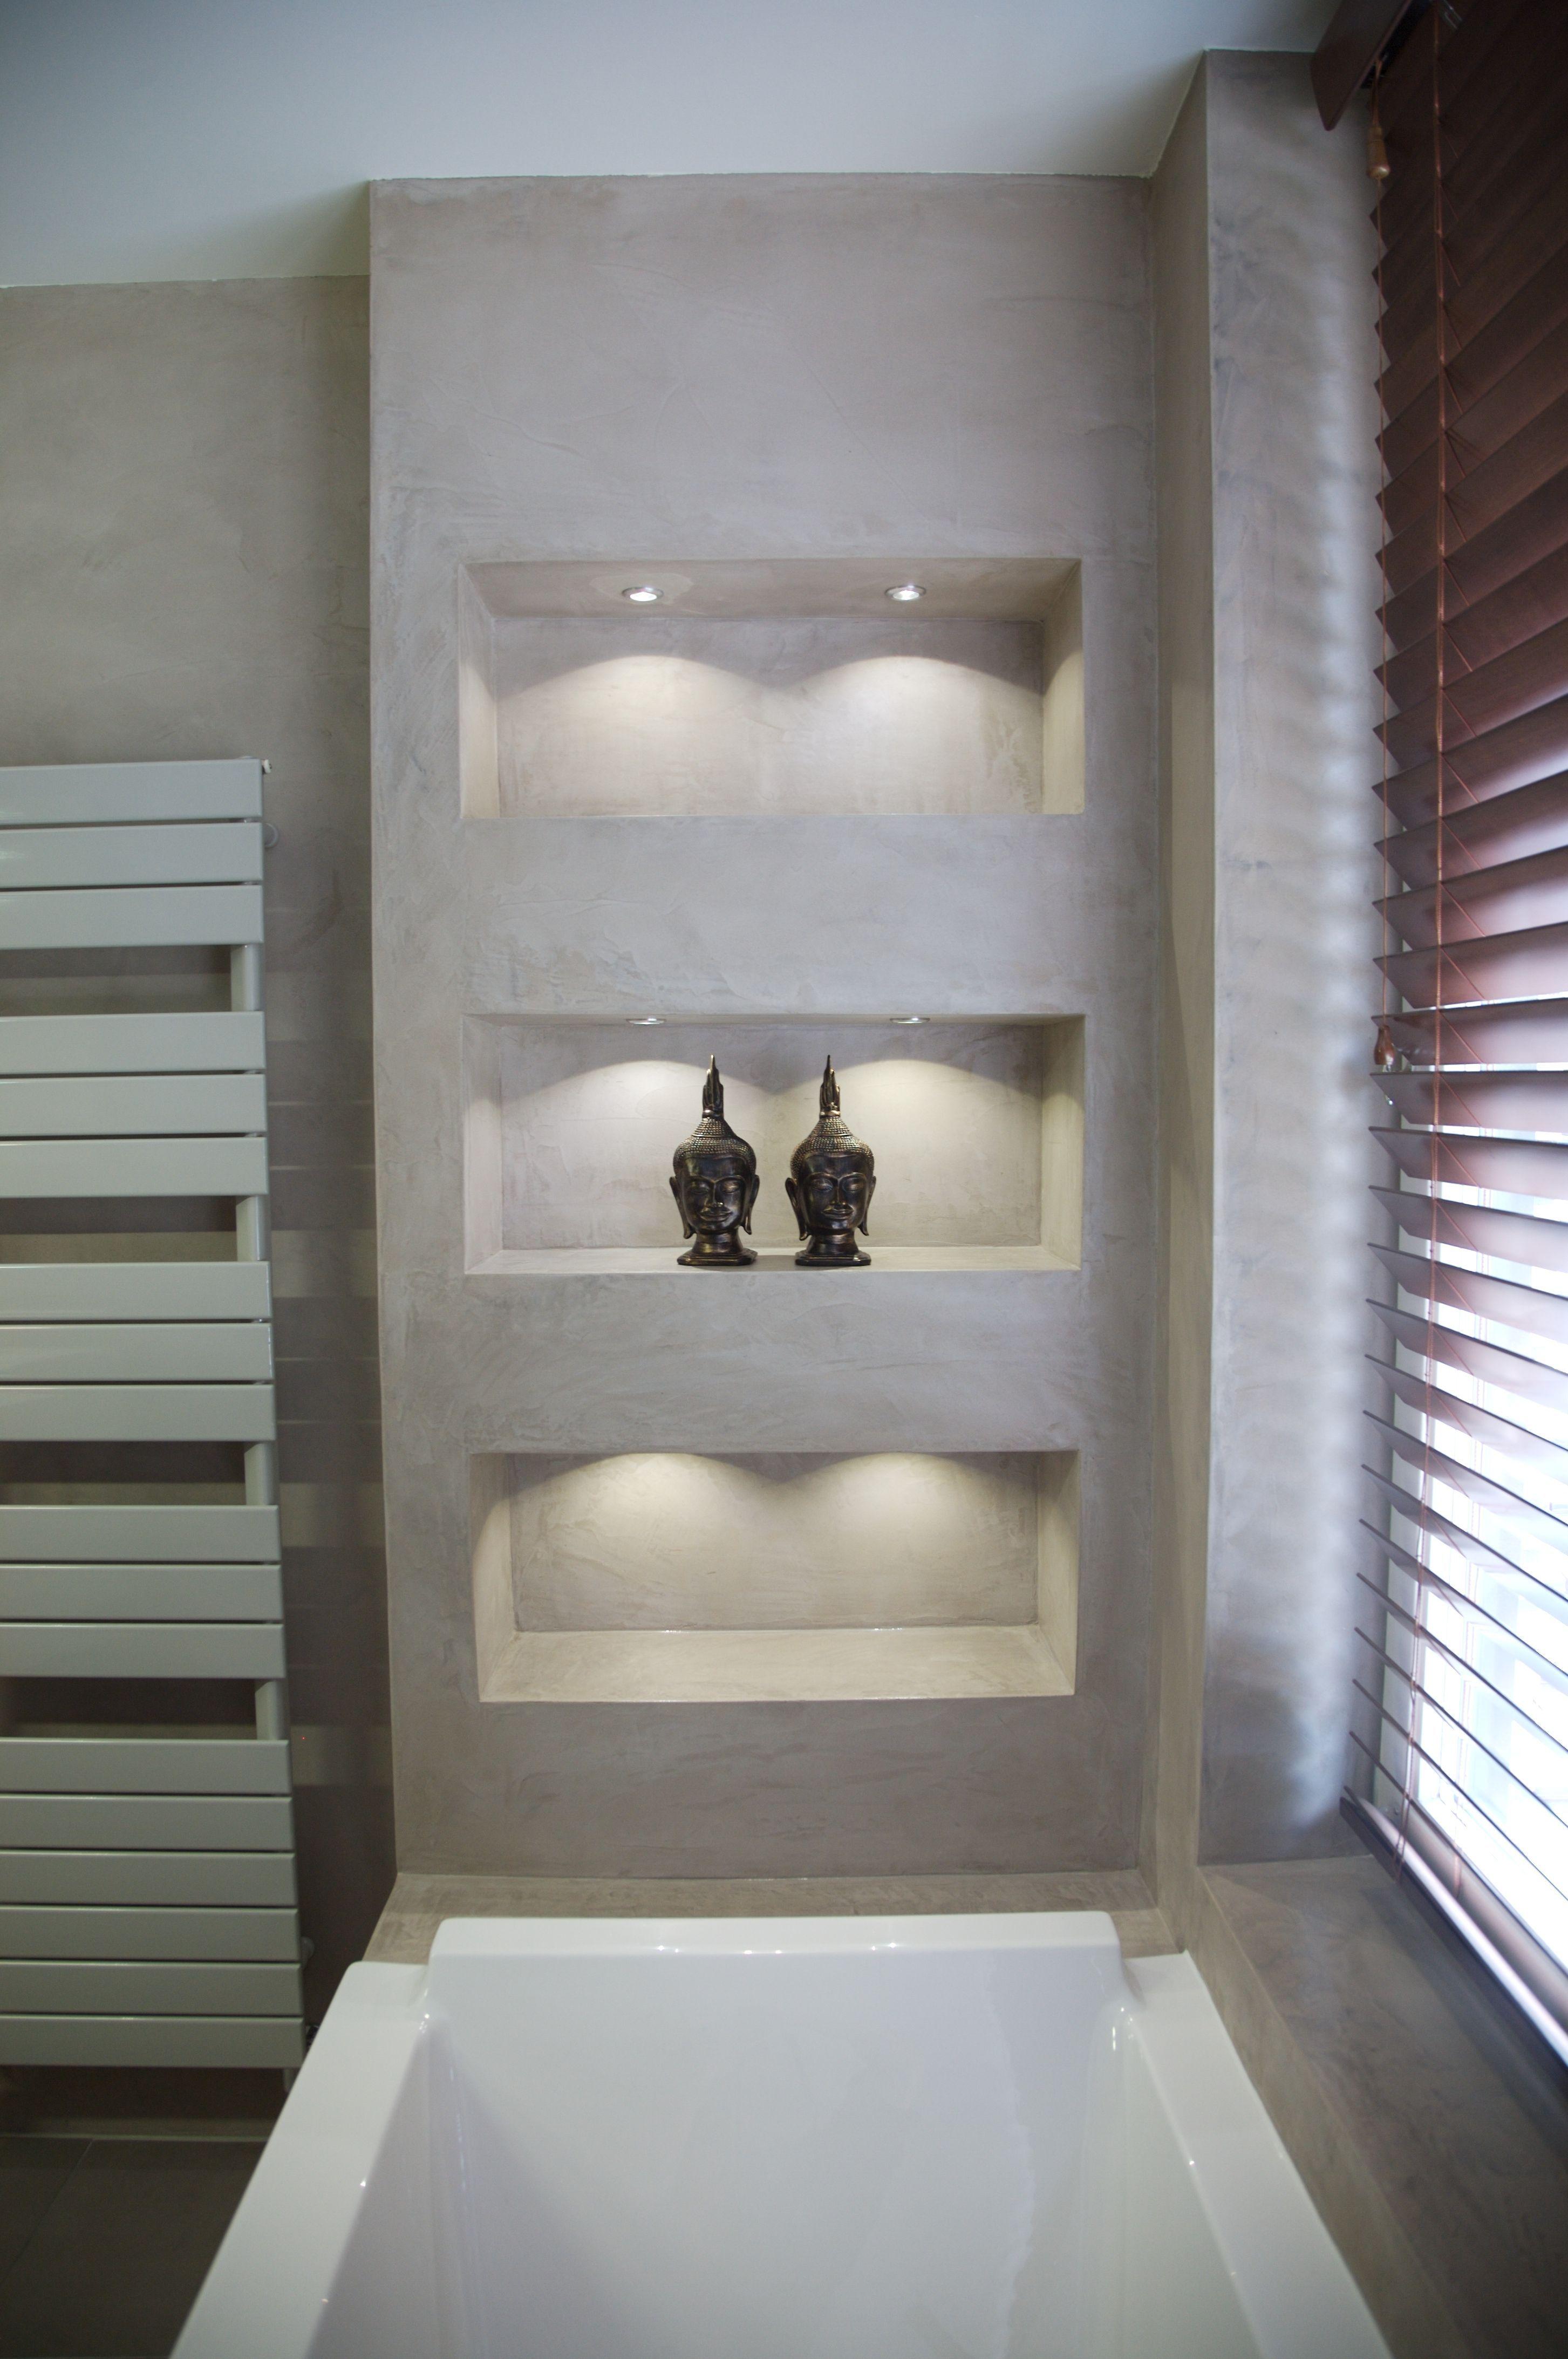 27 Quoet Regal Betonoptik Badezimmer Badezimmer Klein Badezimmer Innenausstattung